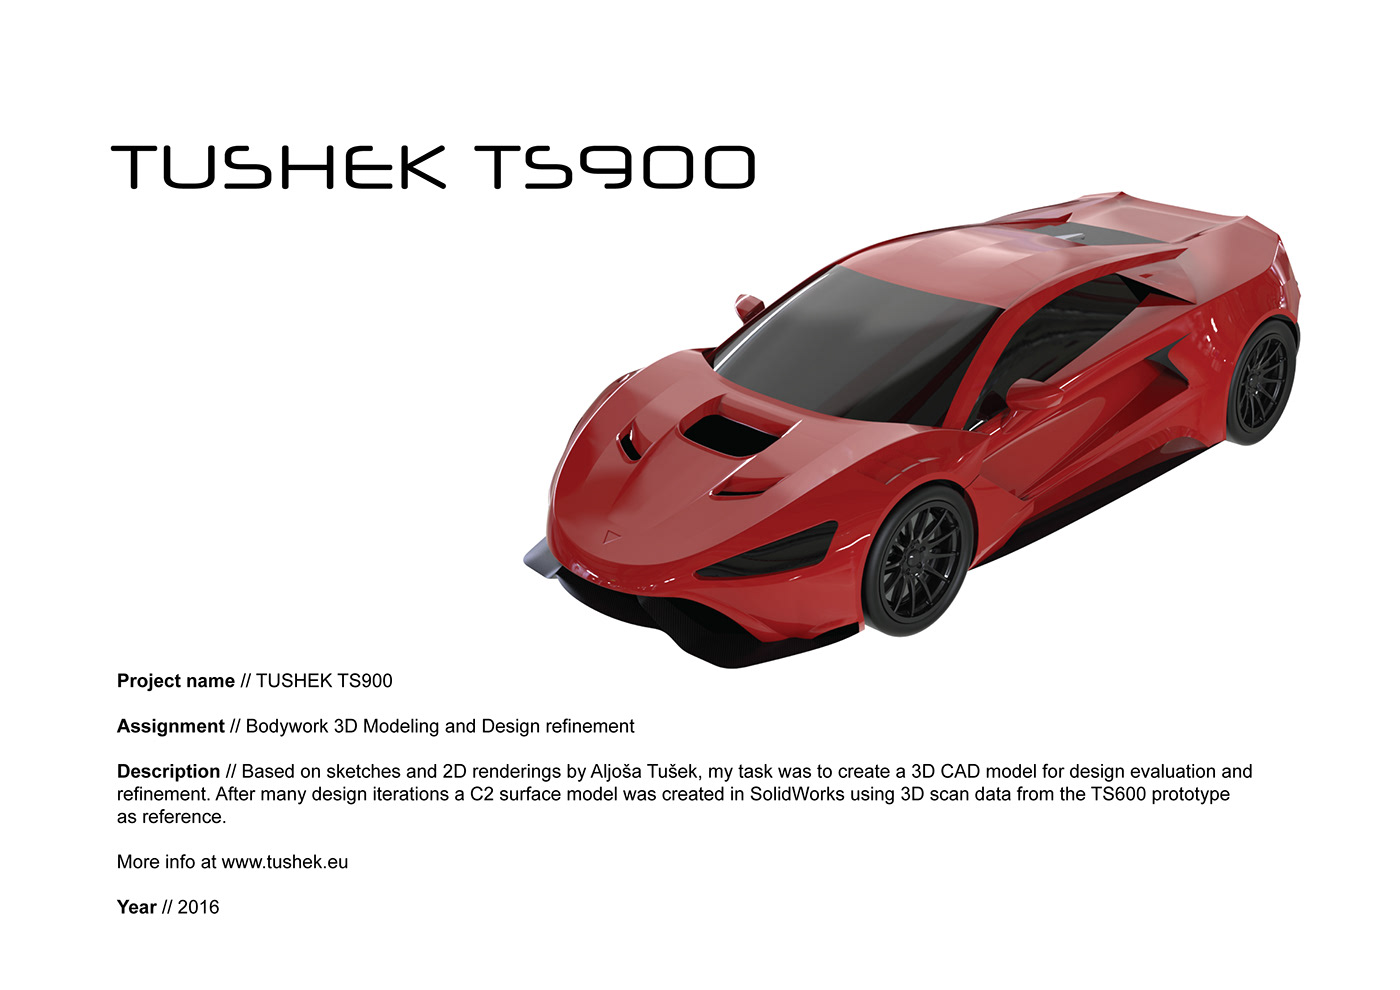 tushek ts600 TS900 hypercar Sportscar bodywork modeling